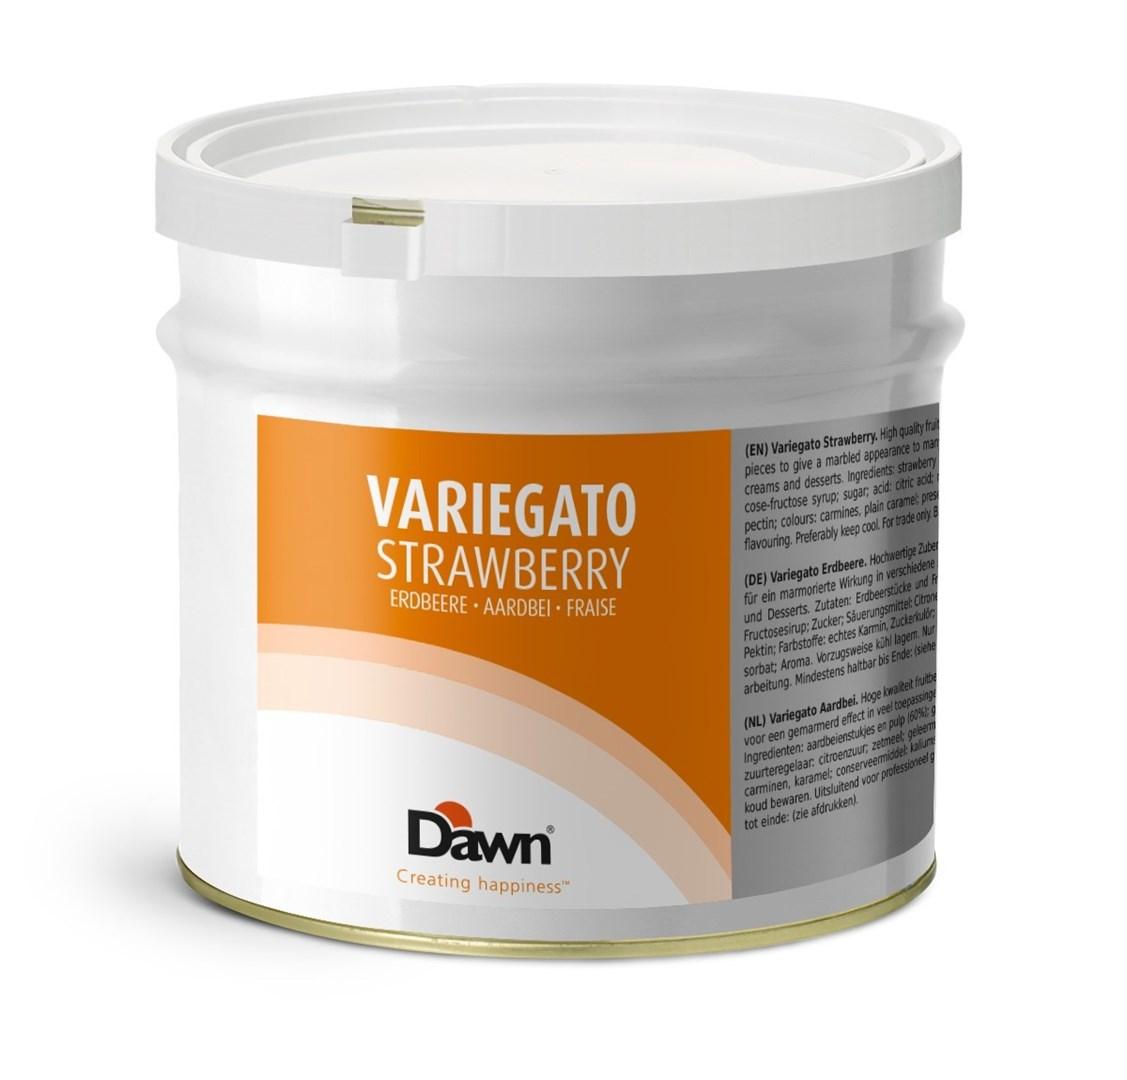 Productafbeelding Dawn Variegato Aardbei 3,5 kg blik